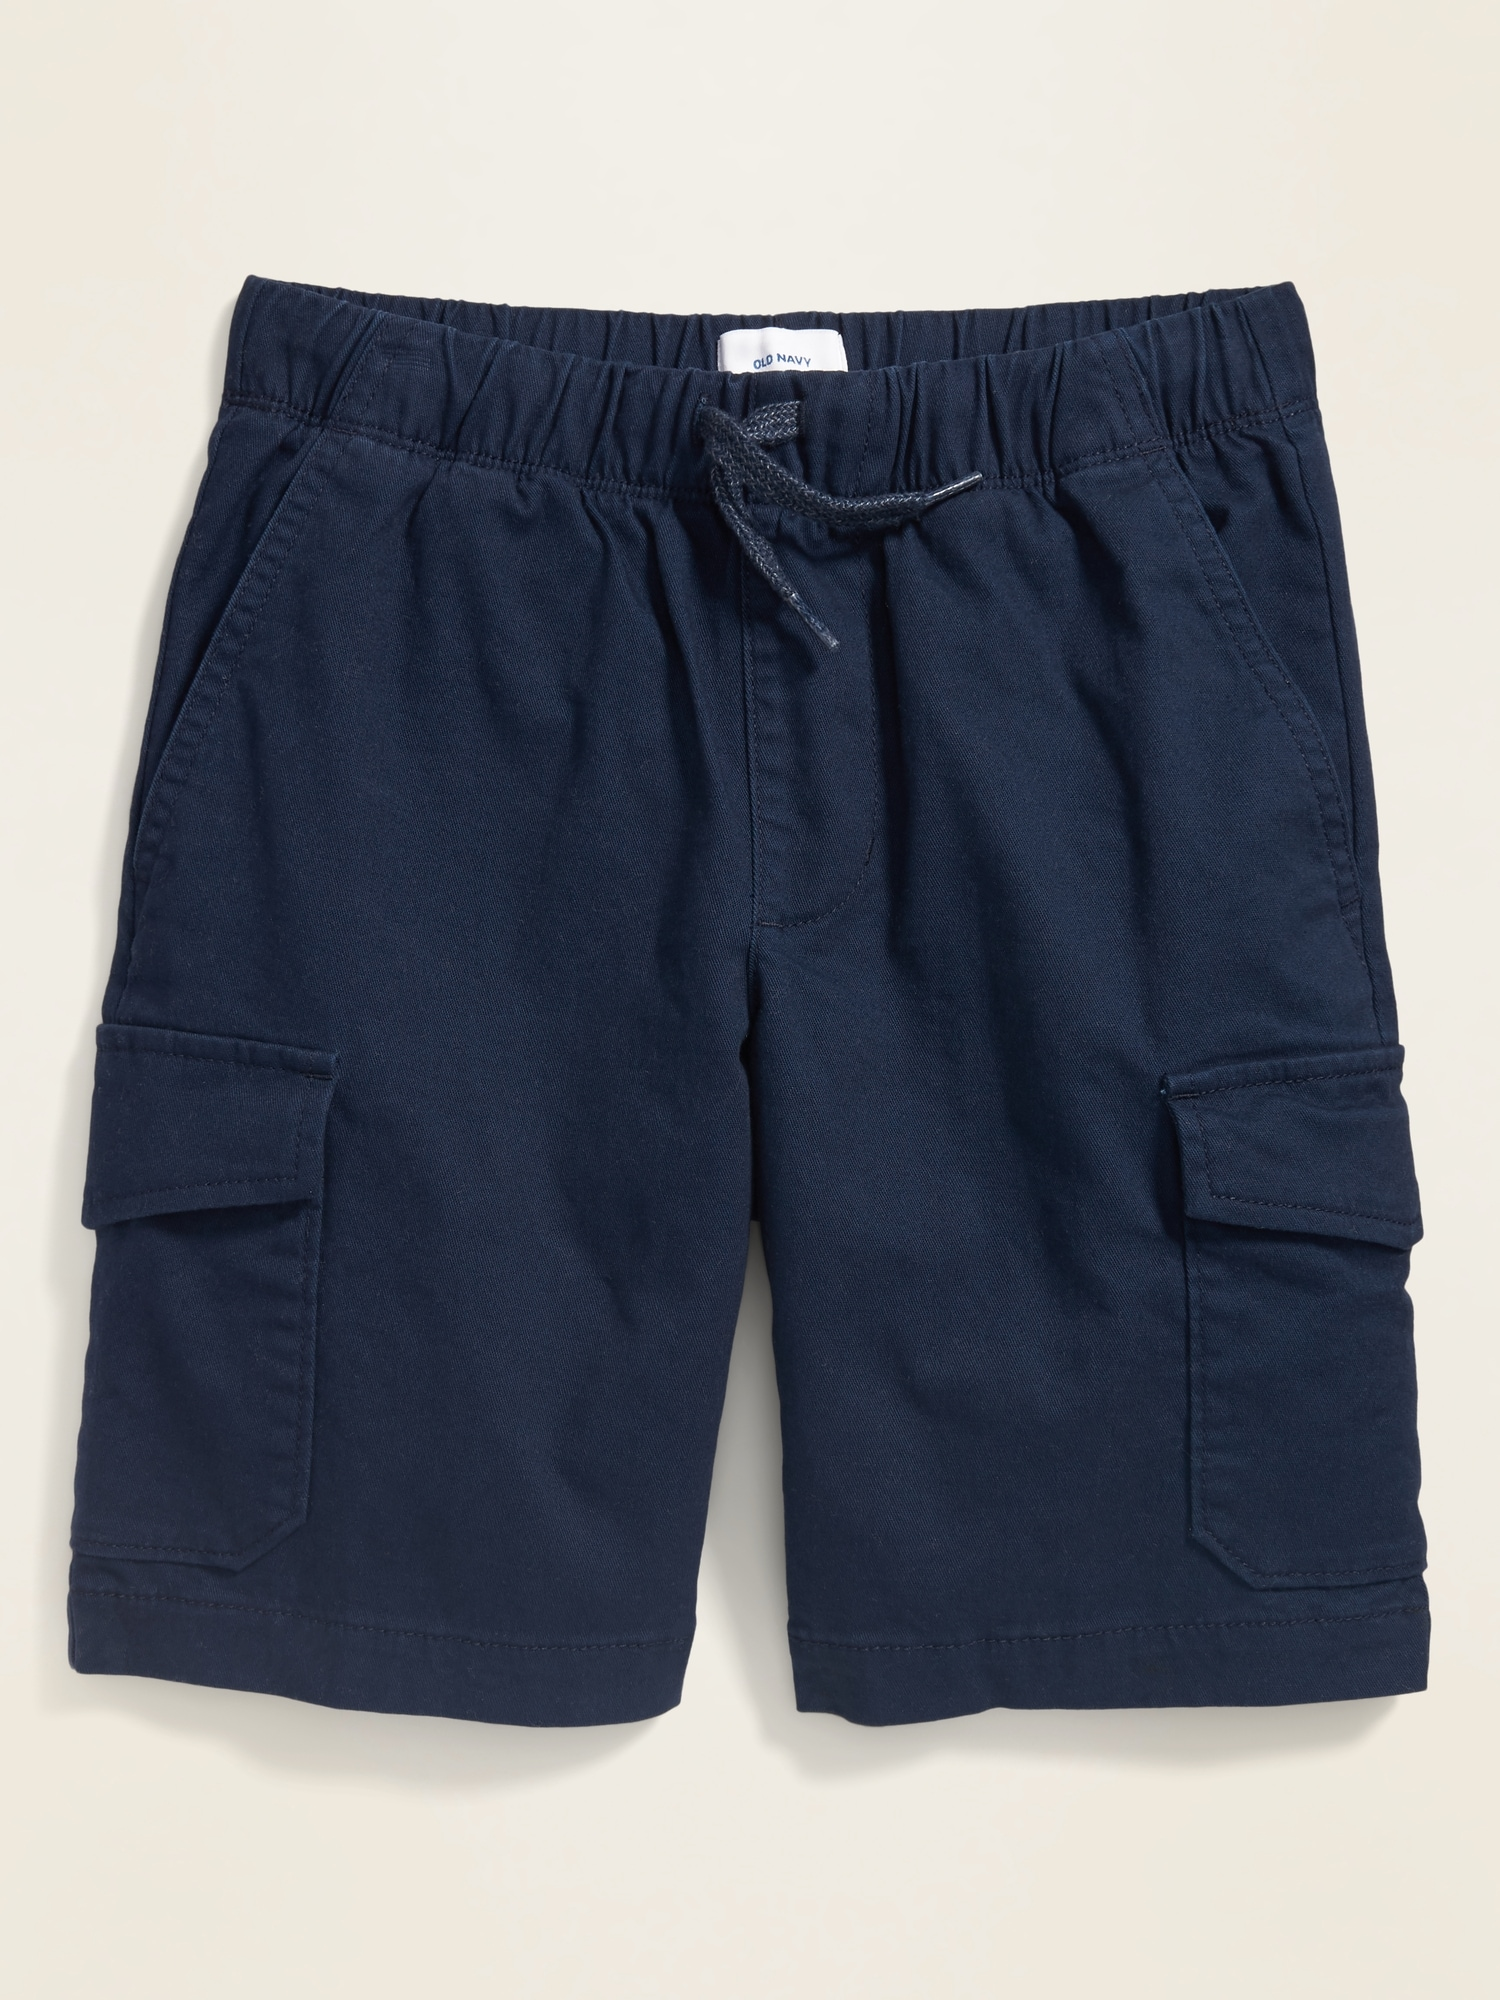 *Hot Deal* Straight Built-In Flex Cargo Jogger Shorts